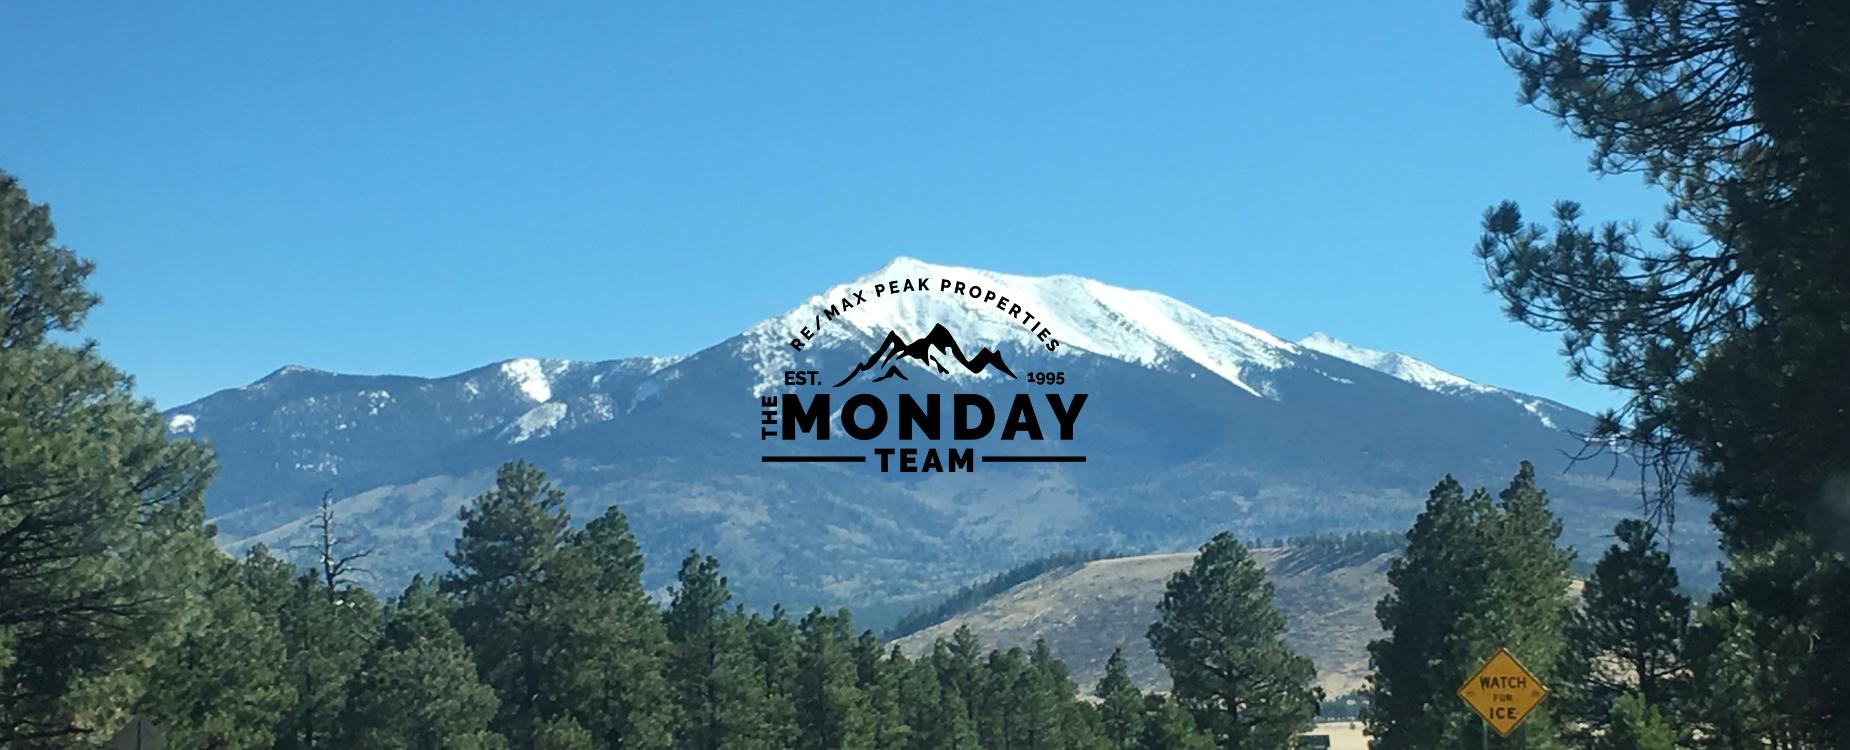 Monday Team